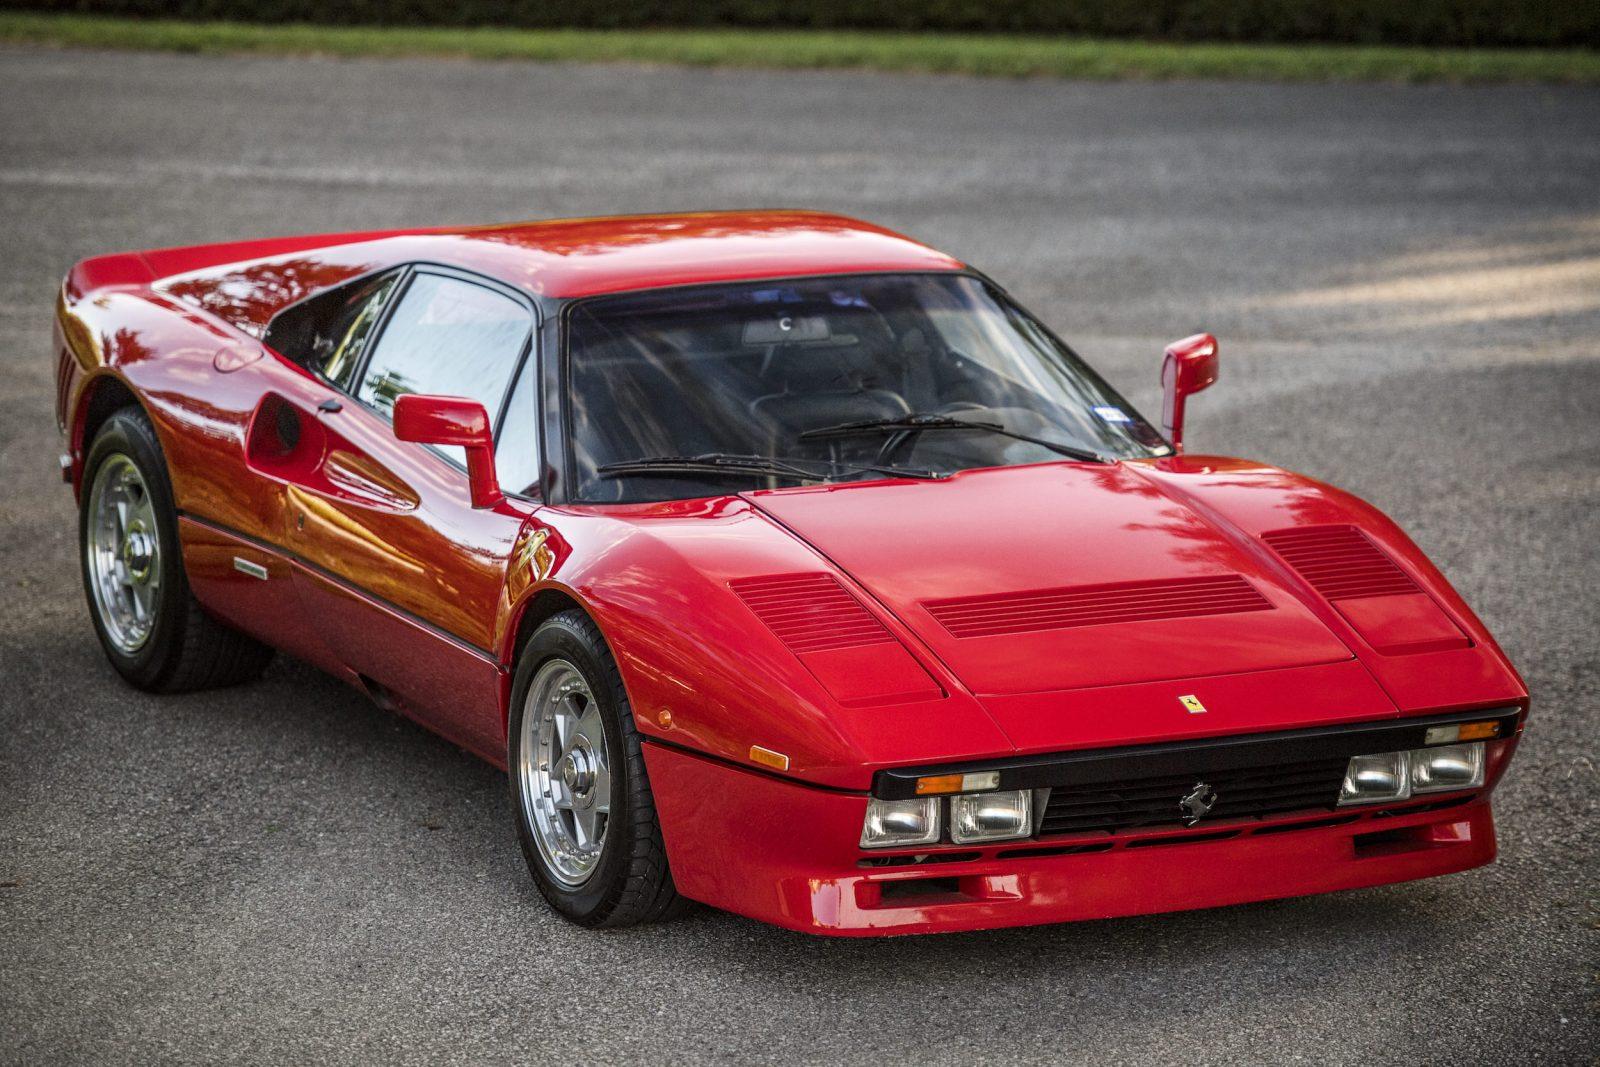 Ferrari-288-GTO-1600x1067.jpg